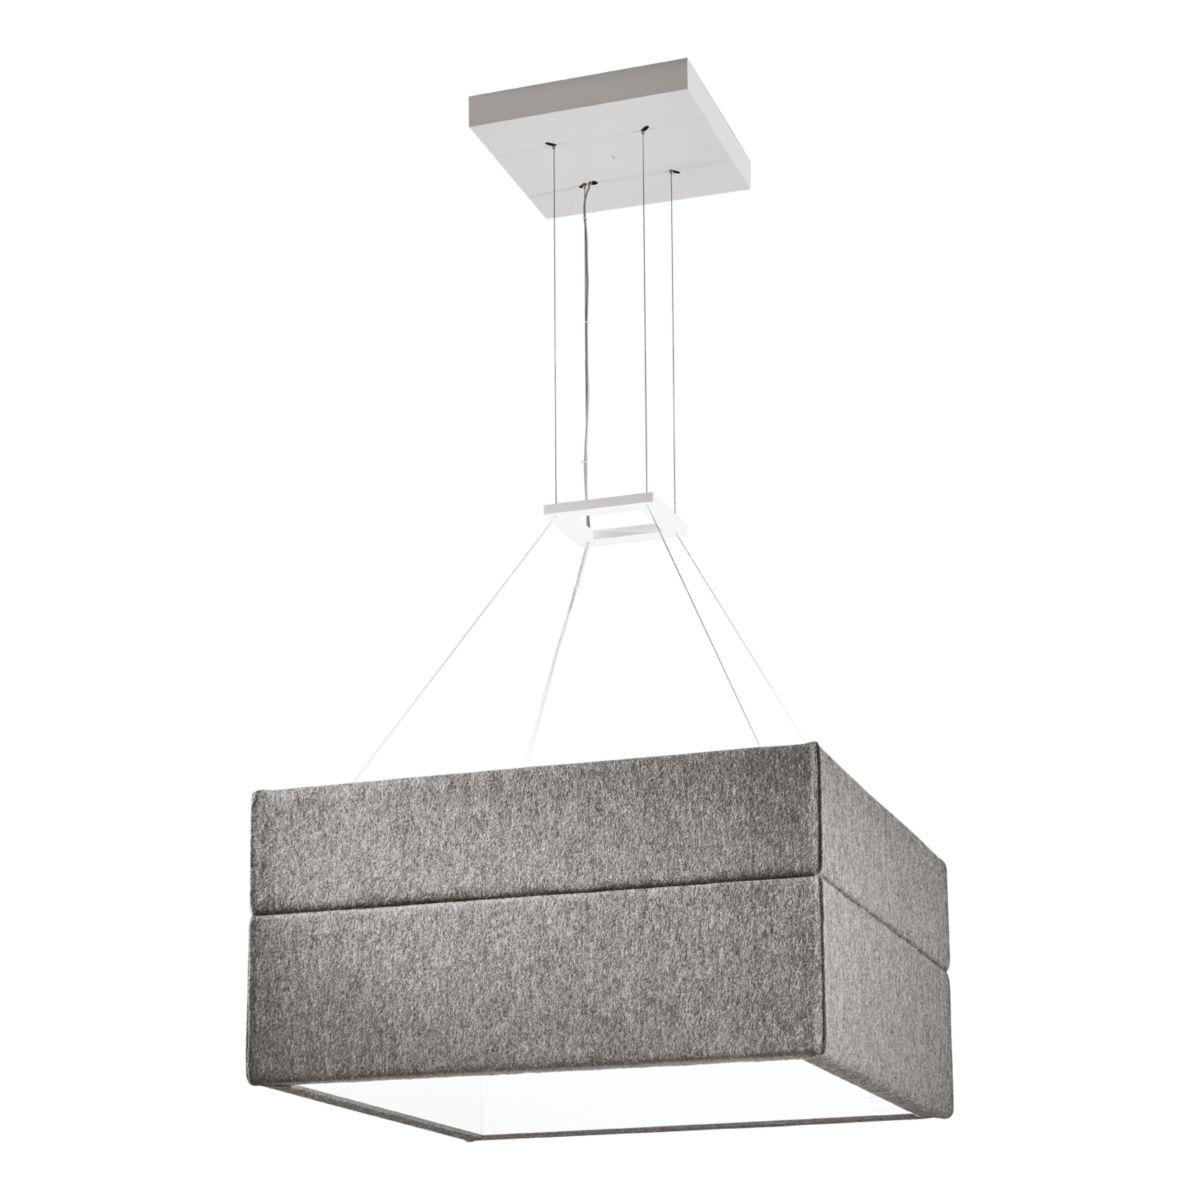 Shaper Sense Box - Acoustic Lighting Luminaire